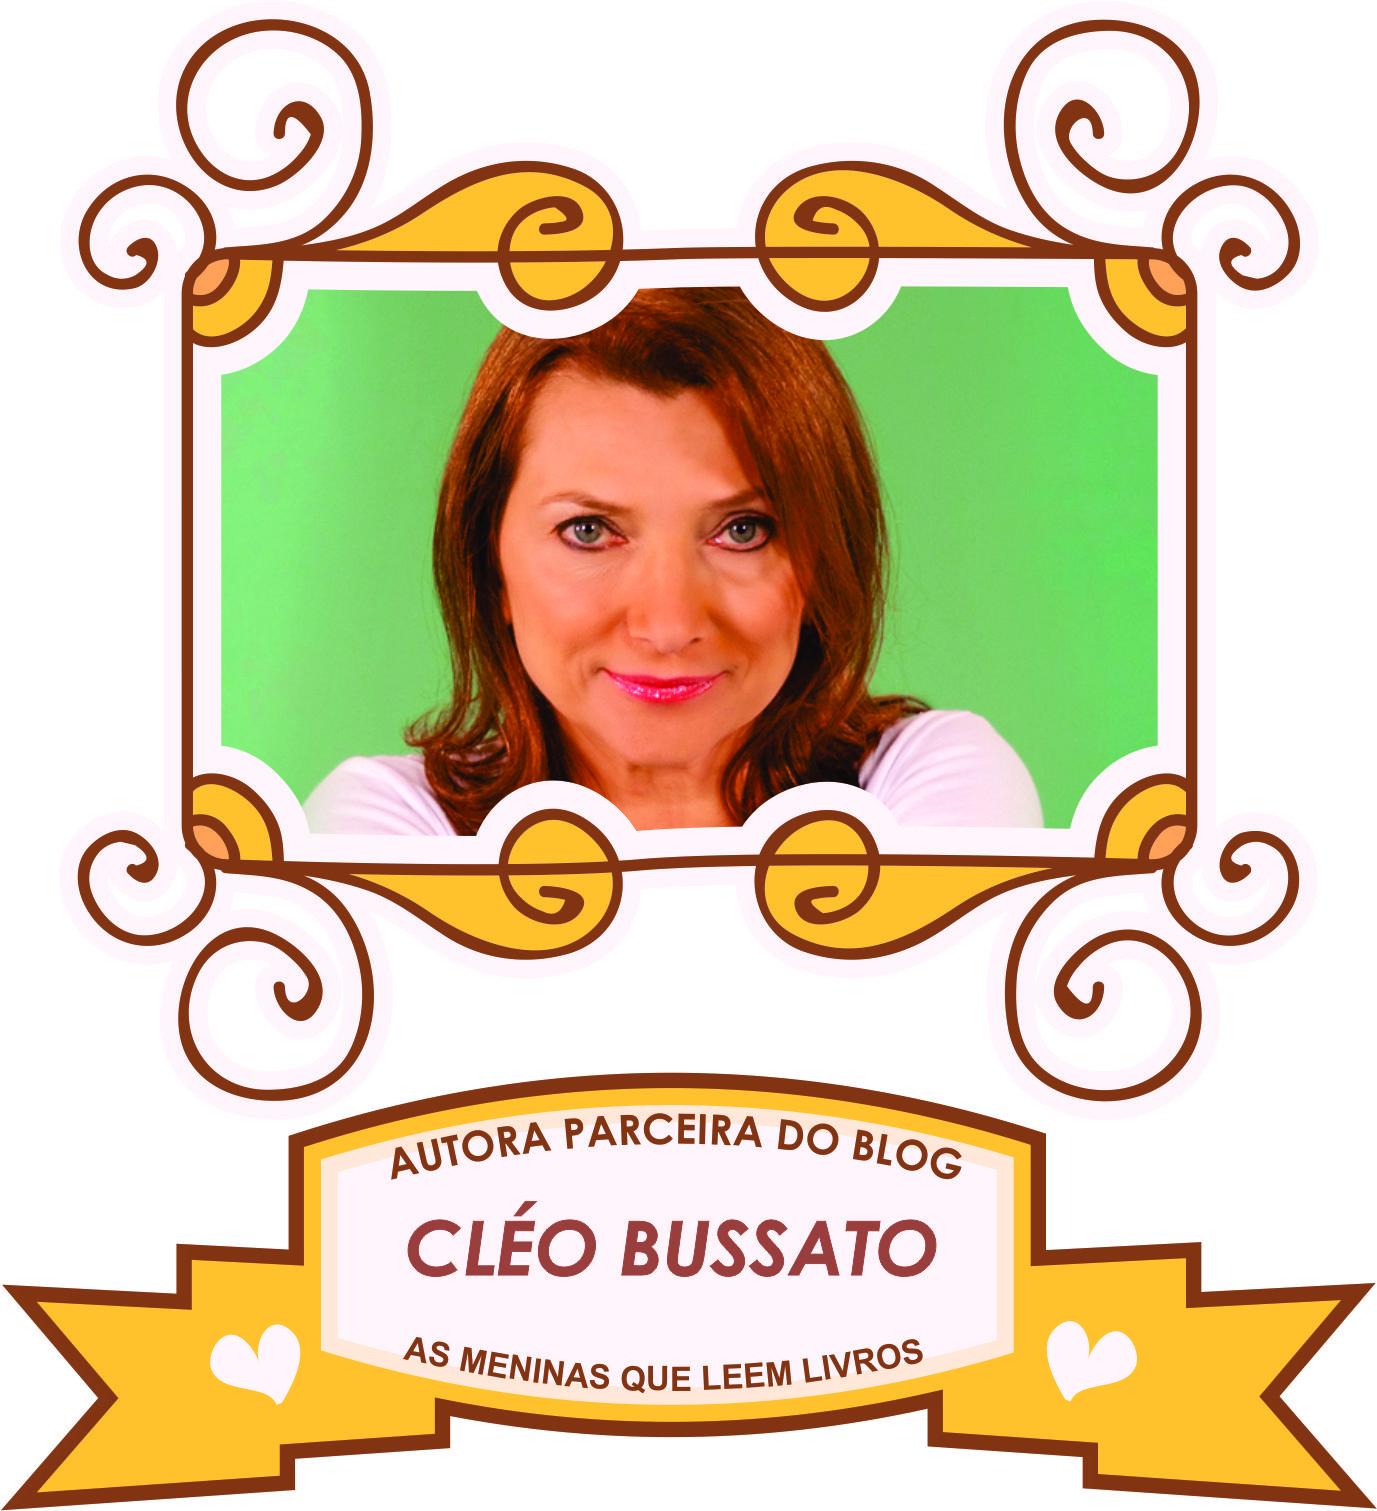 Cléo Bussato